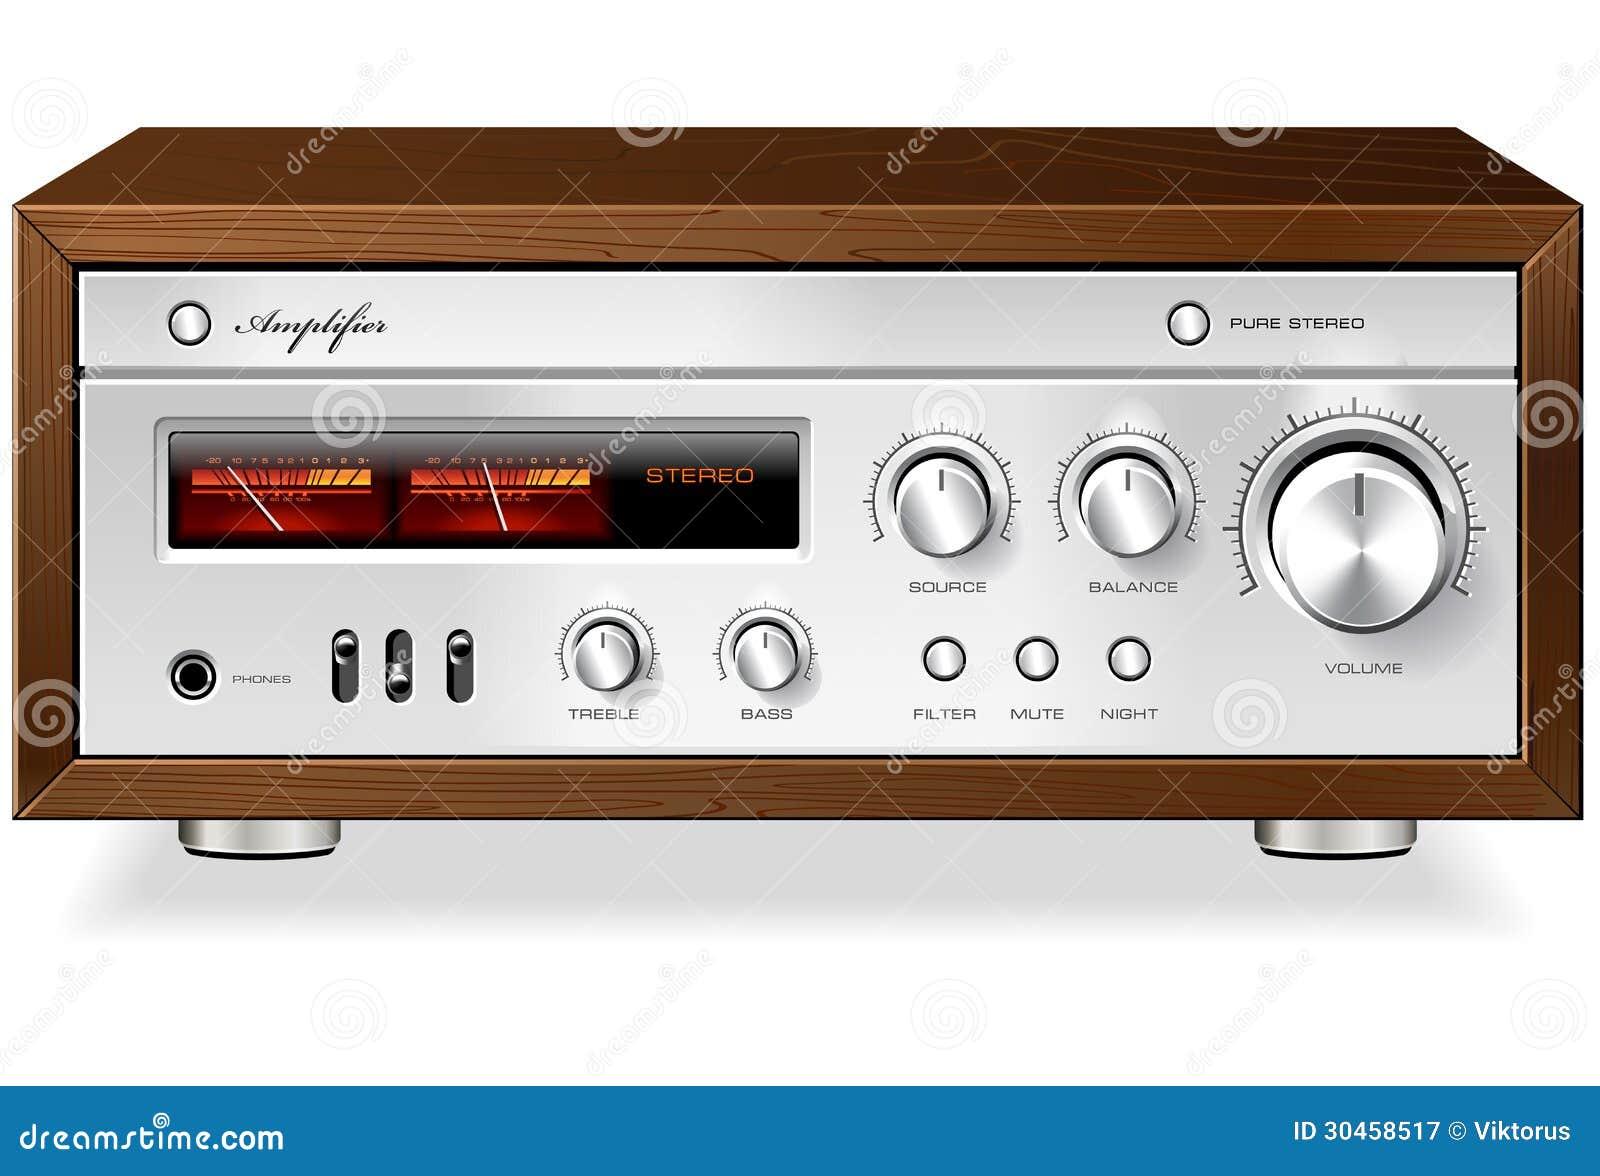 Wiring Car Audio System besides Radio Symbols Pdf furthermore Wiring Diagram For Sony Car Stereo moreover 2 Channel Car   Wiring Diagram moreover Car Audio Center Channel Speakers. on car audio lifiers